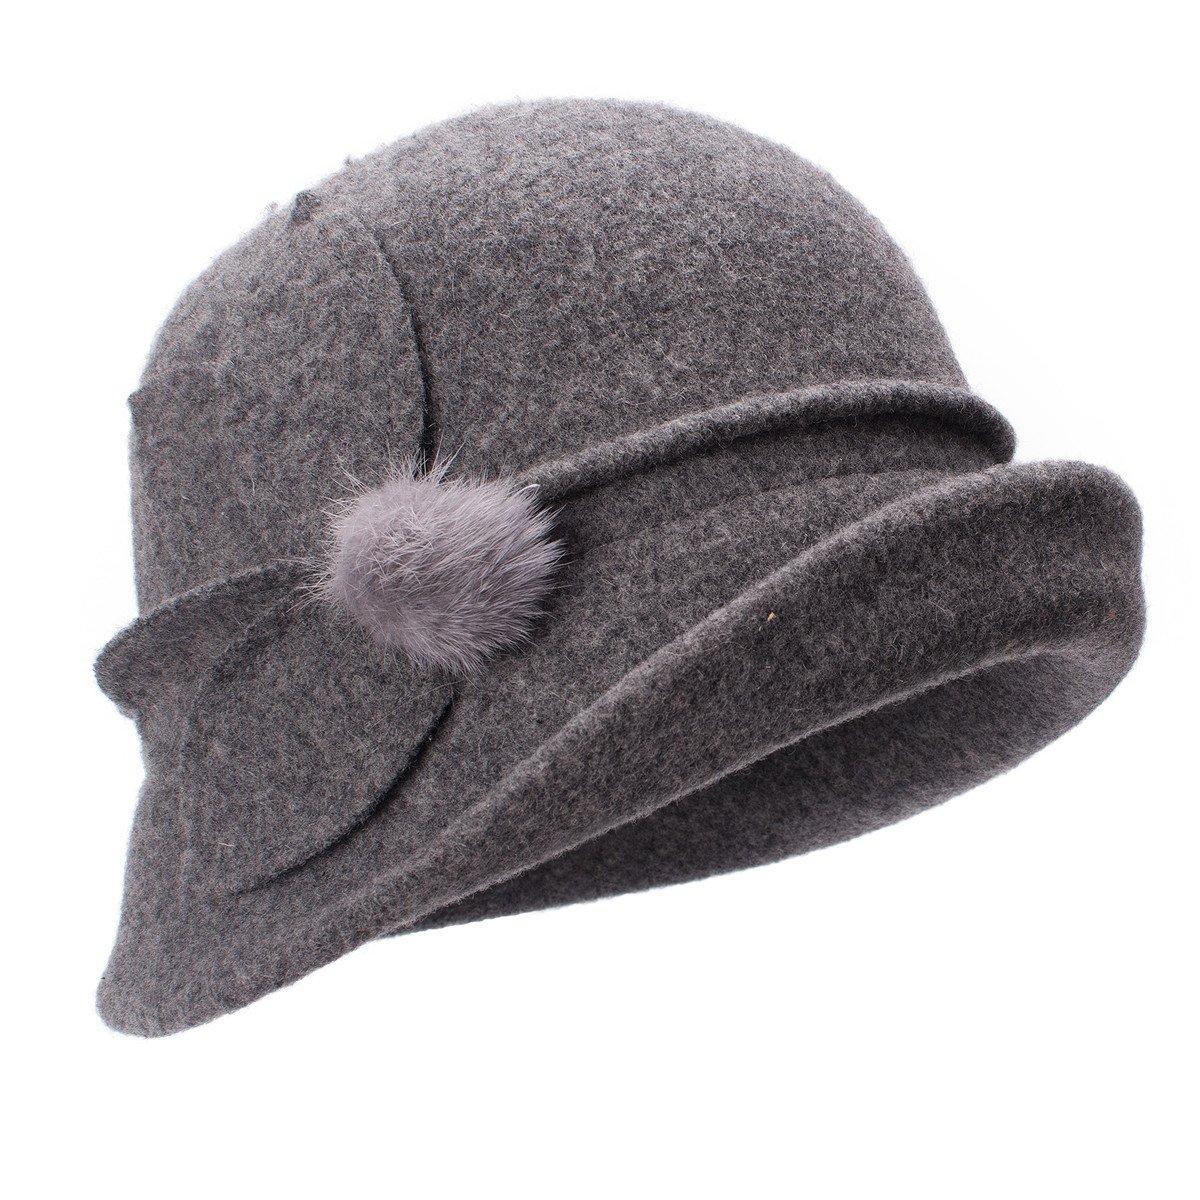 Lawliet Womens Retro Upturn Brim Wool Blend Cloche Church Wedding Hat A474 (Gray)